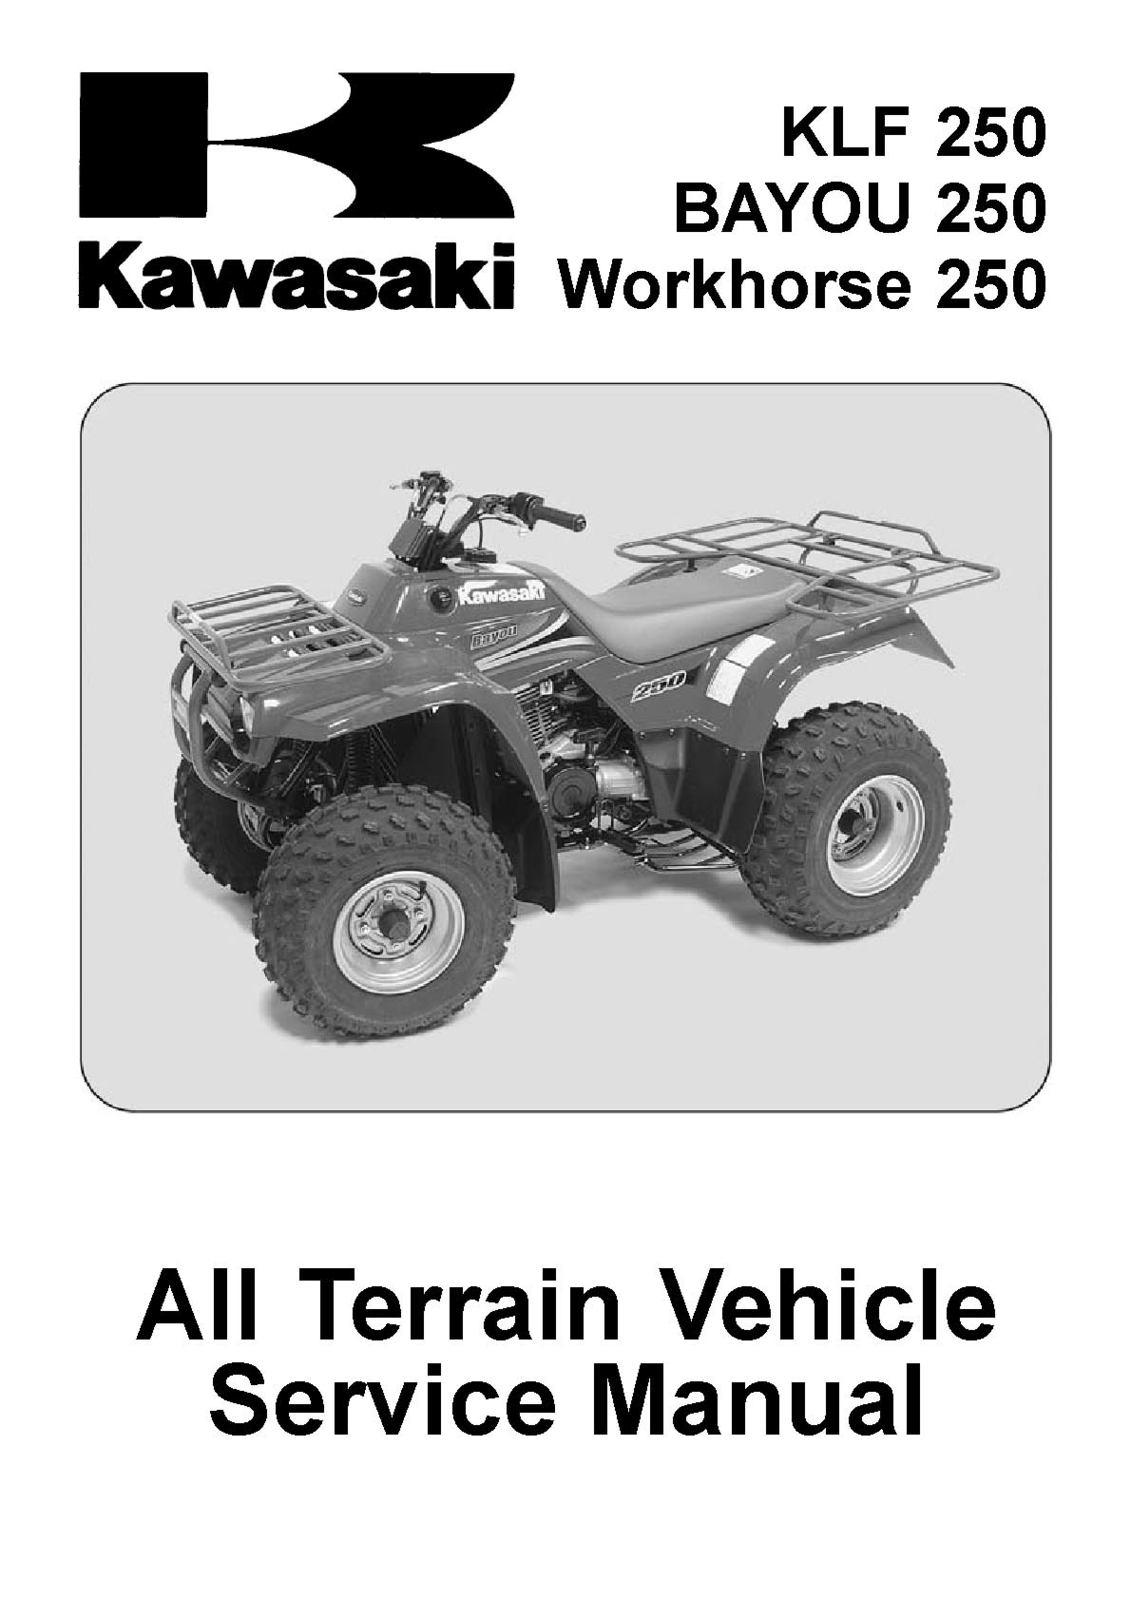 Klf 250 bayou 250 workhorse 250